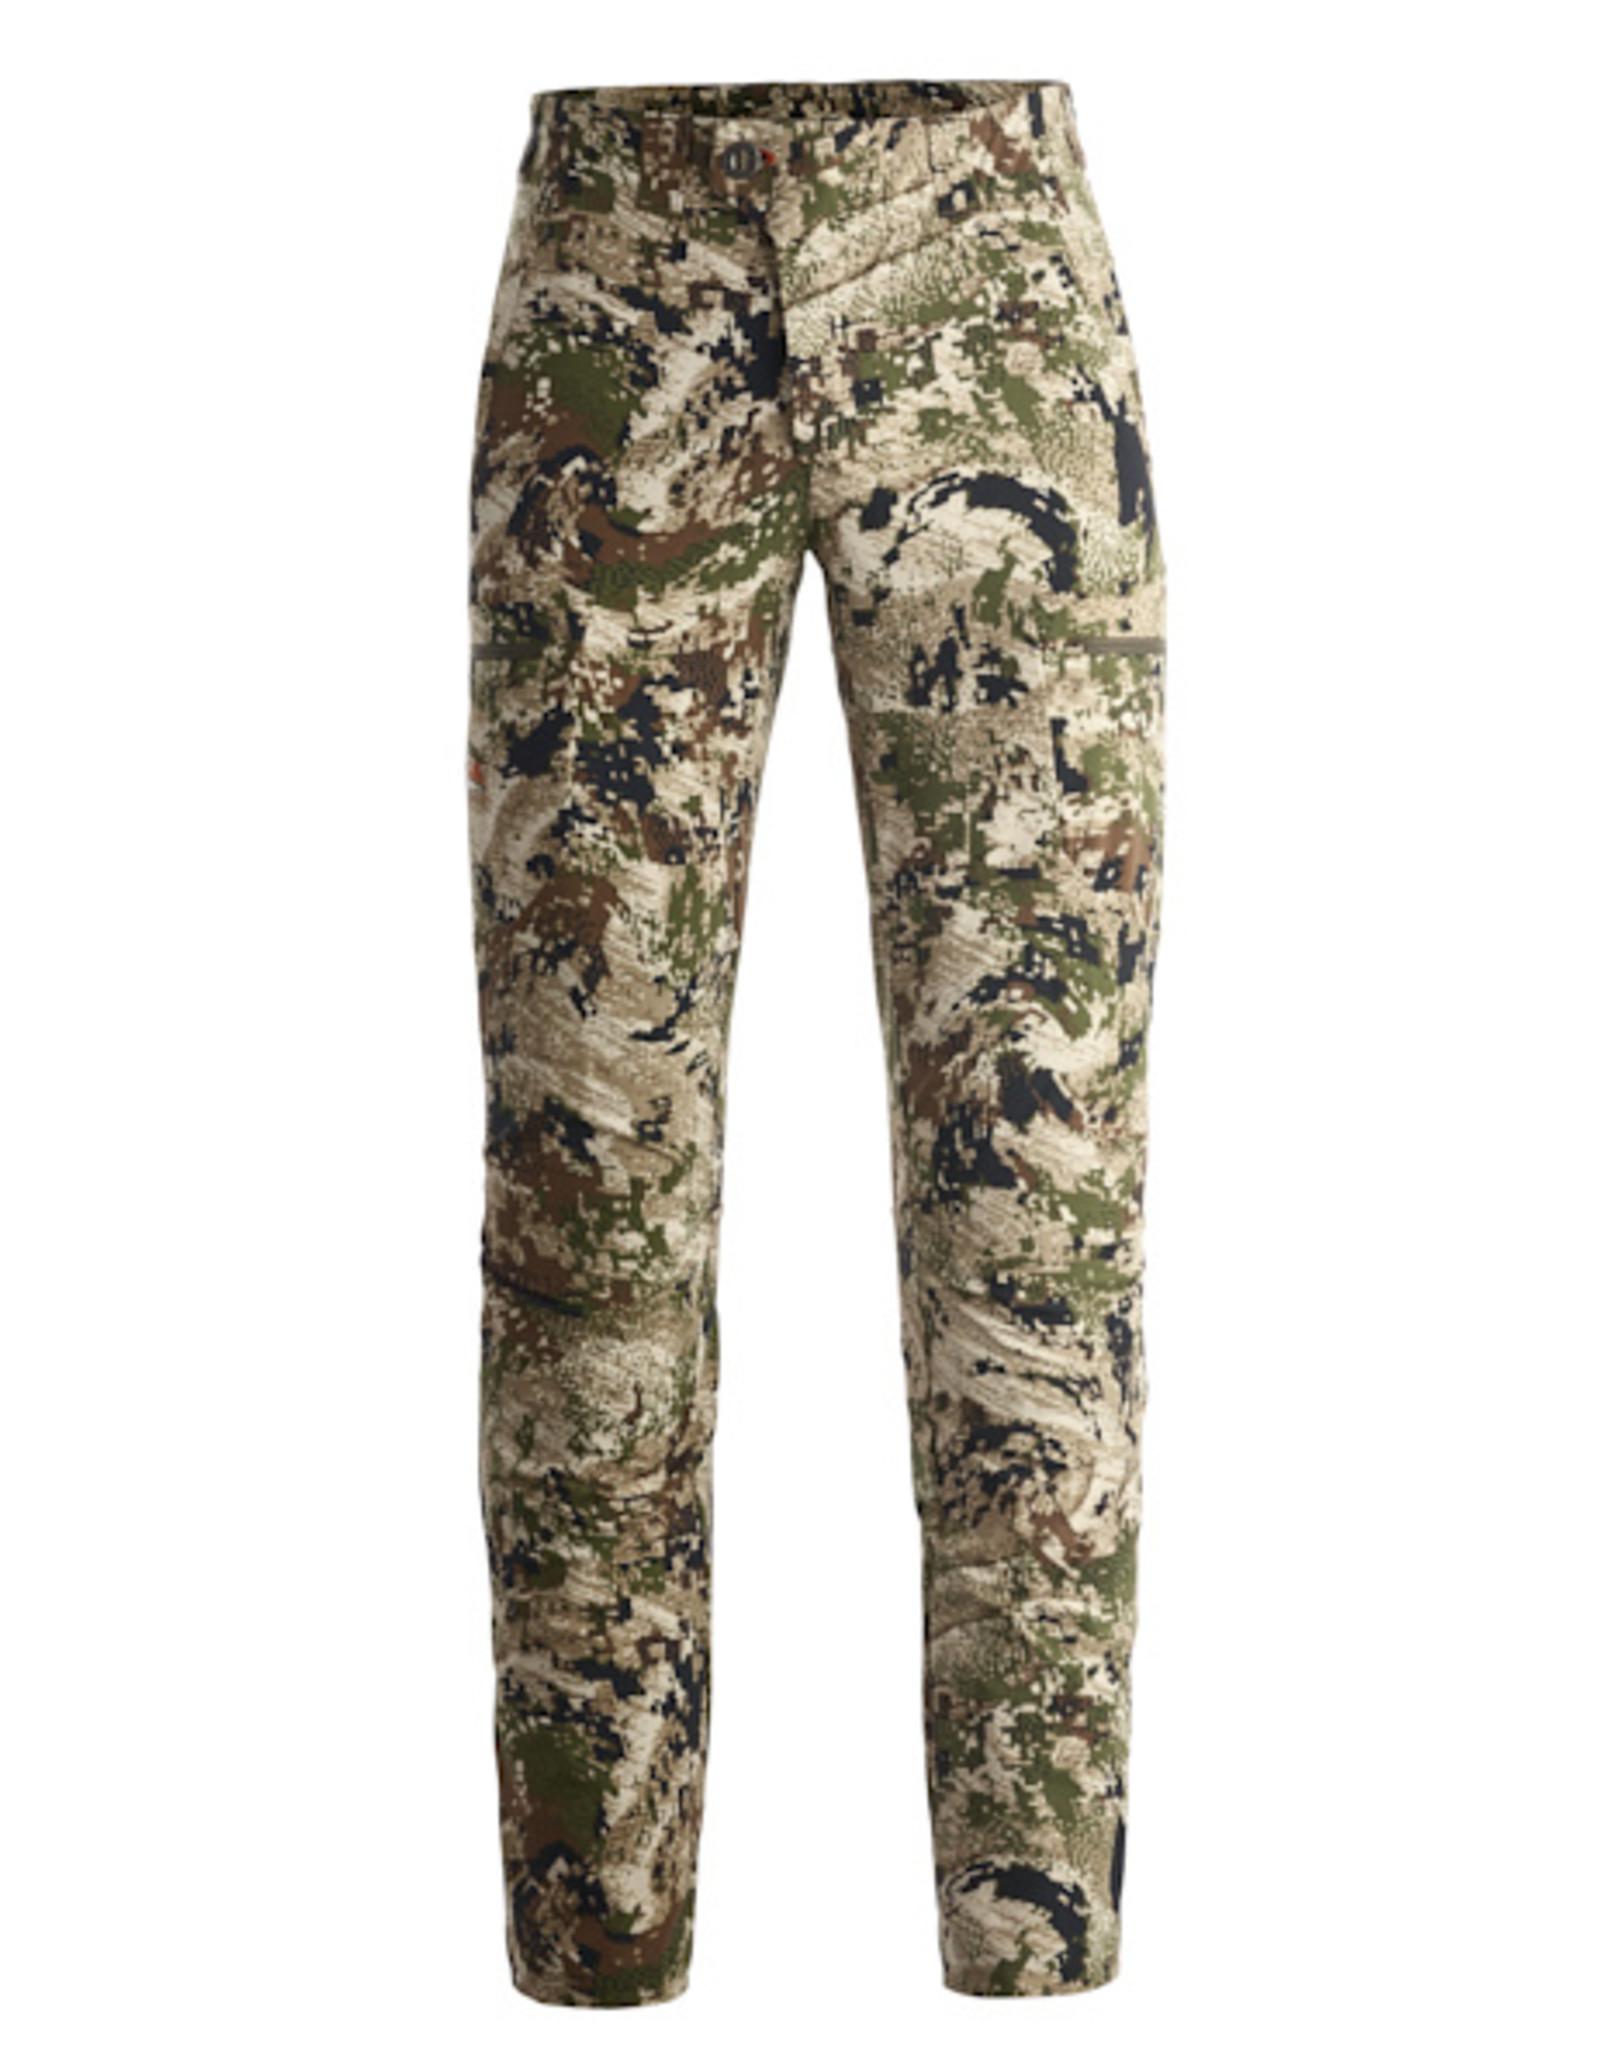 Sitka  Ascent Pants